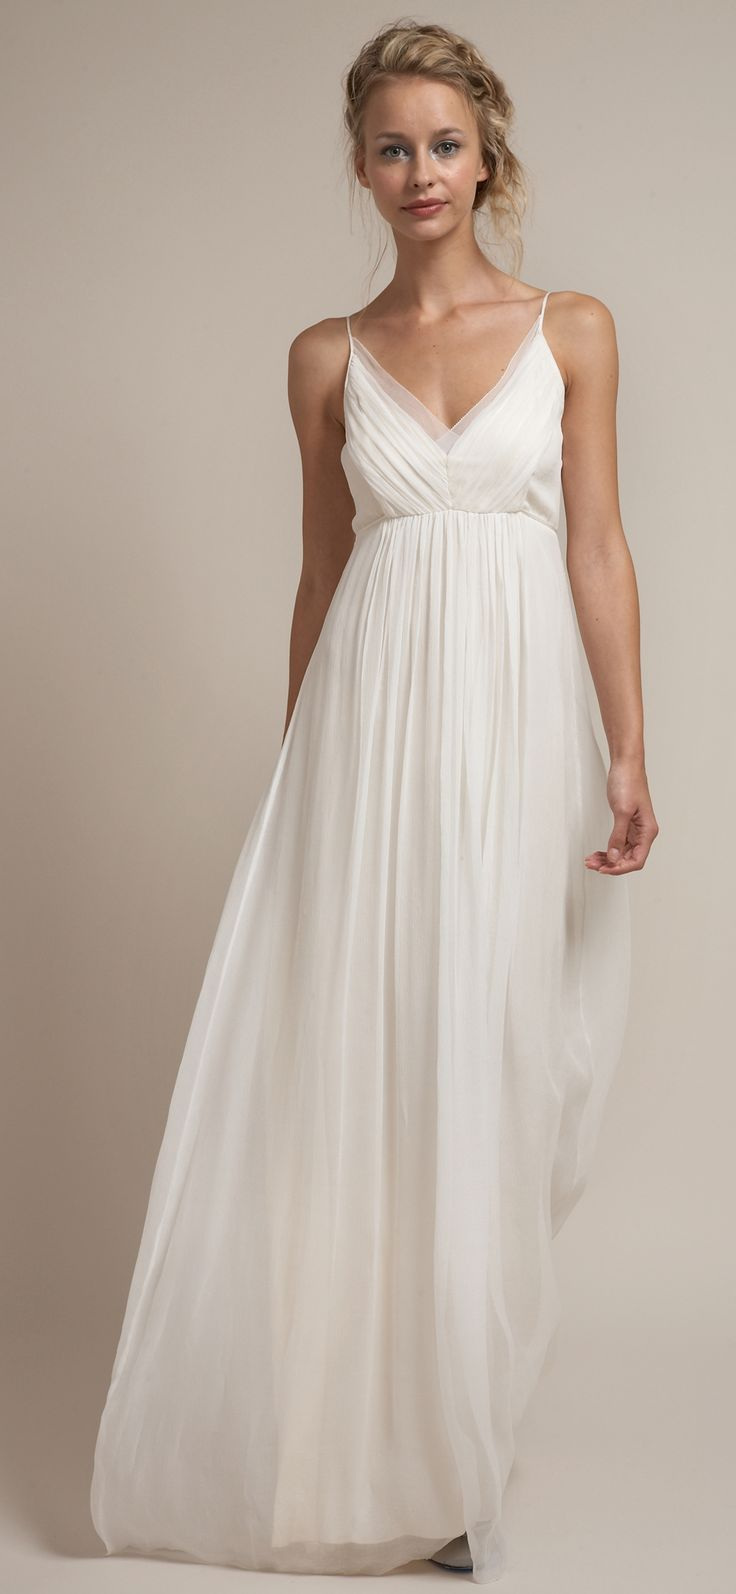 vestidos de novia simple beach wedding dresses Rustic Wedding Gowns By Saja Rustic Chic WeddingsSimple WeddingsBeach